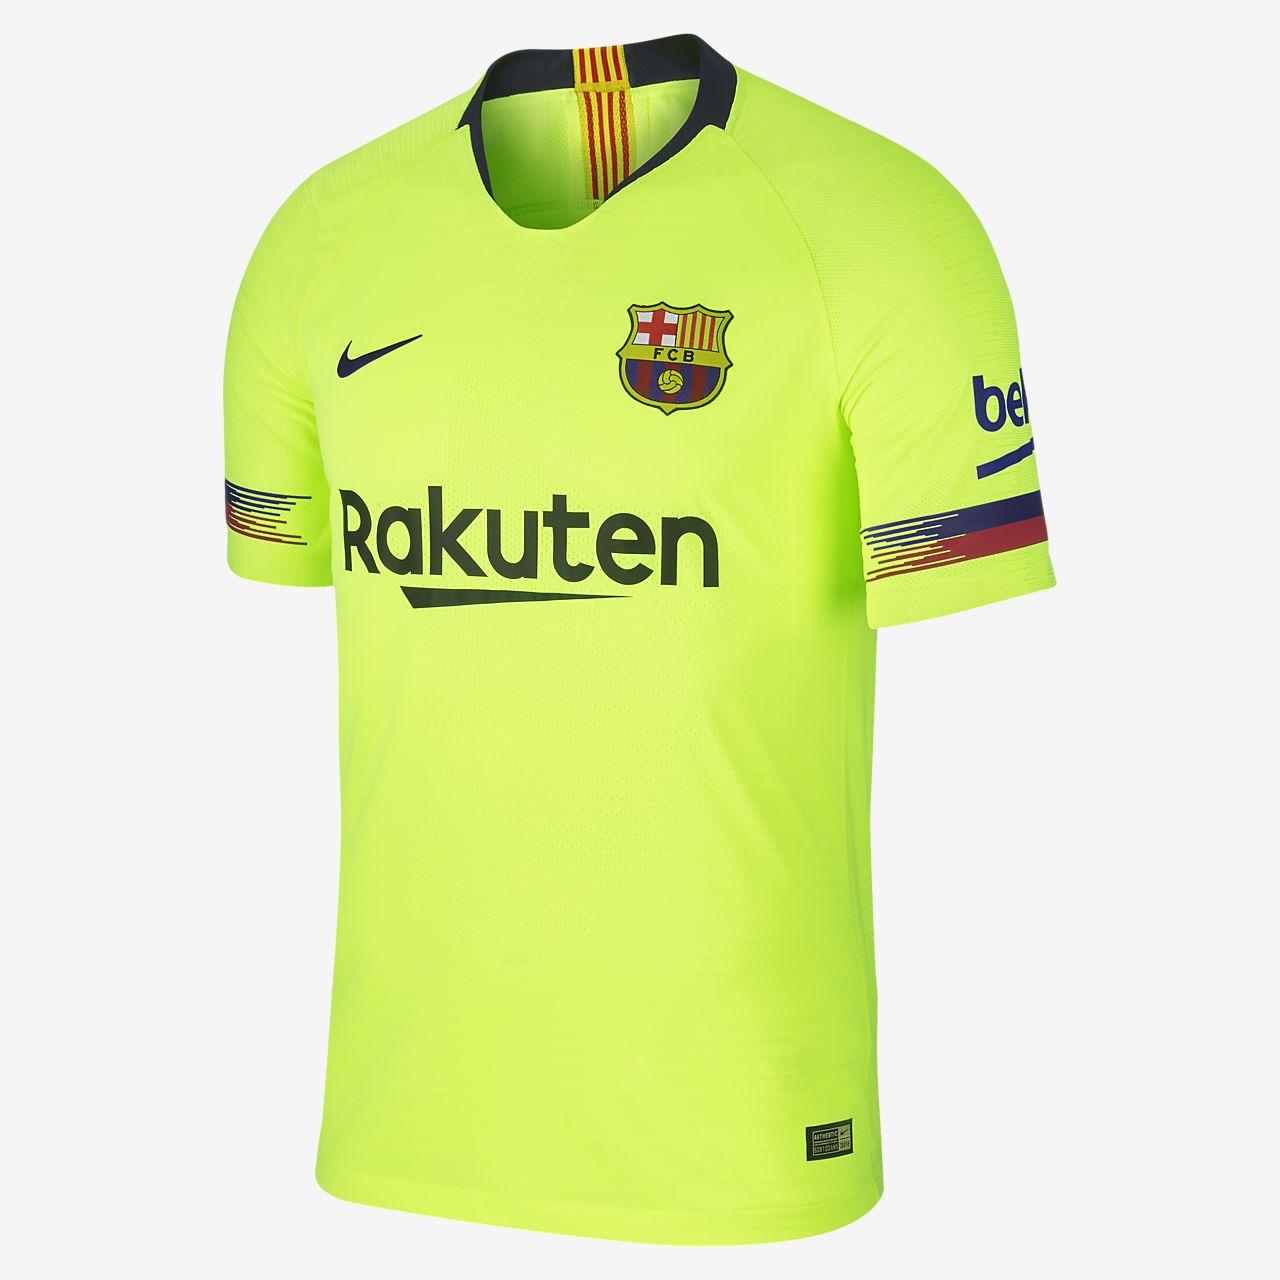 hot sale online 6241b 8d3bd Camiseta de fútbol para hombre 2018 19 FC Barcelona Vapor Match Away